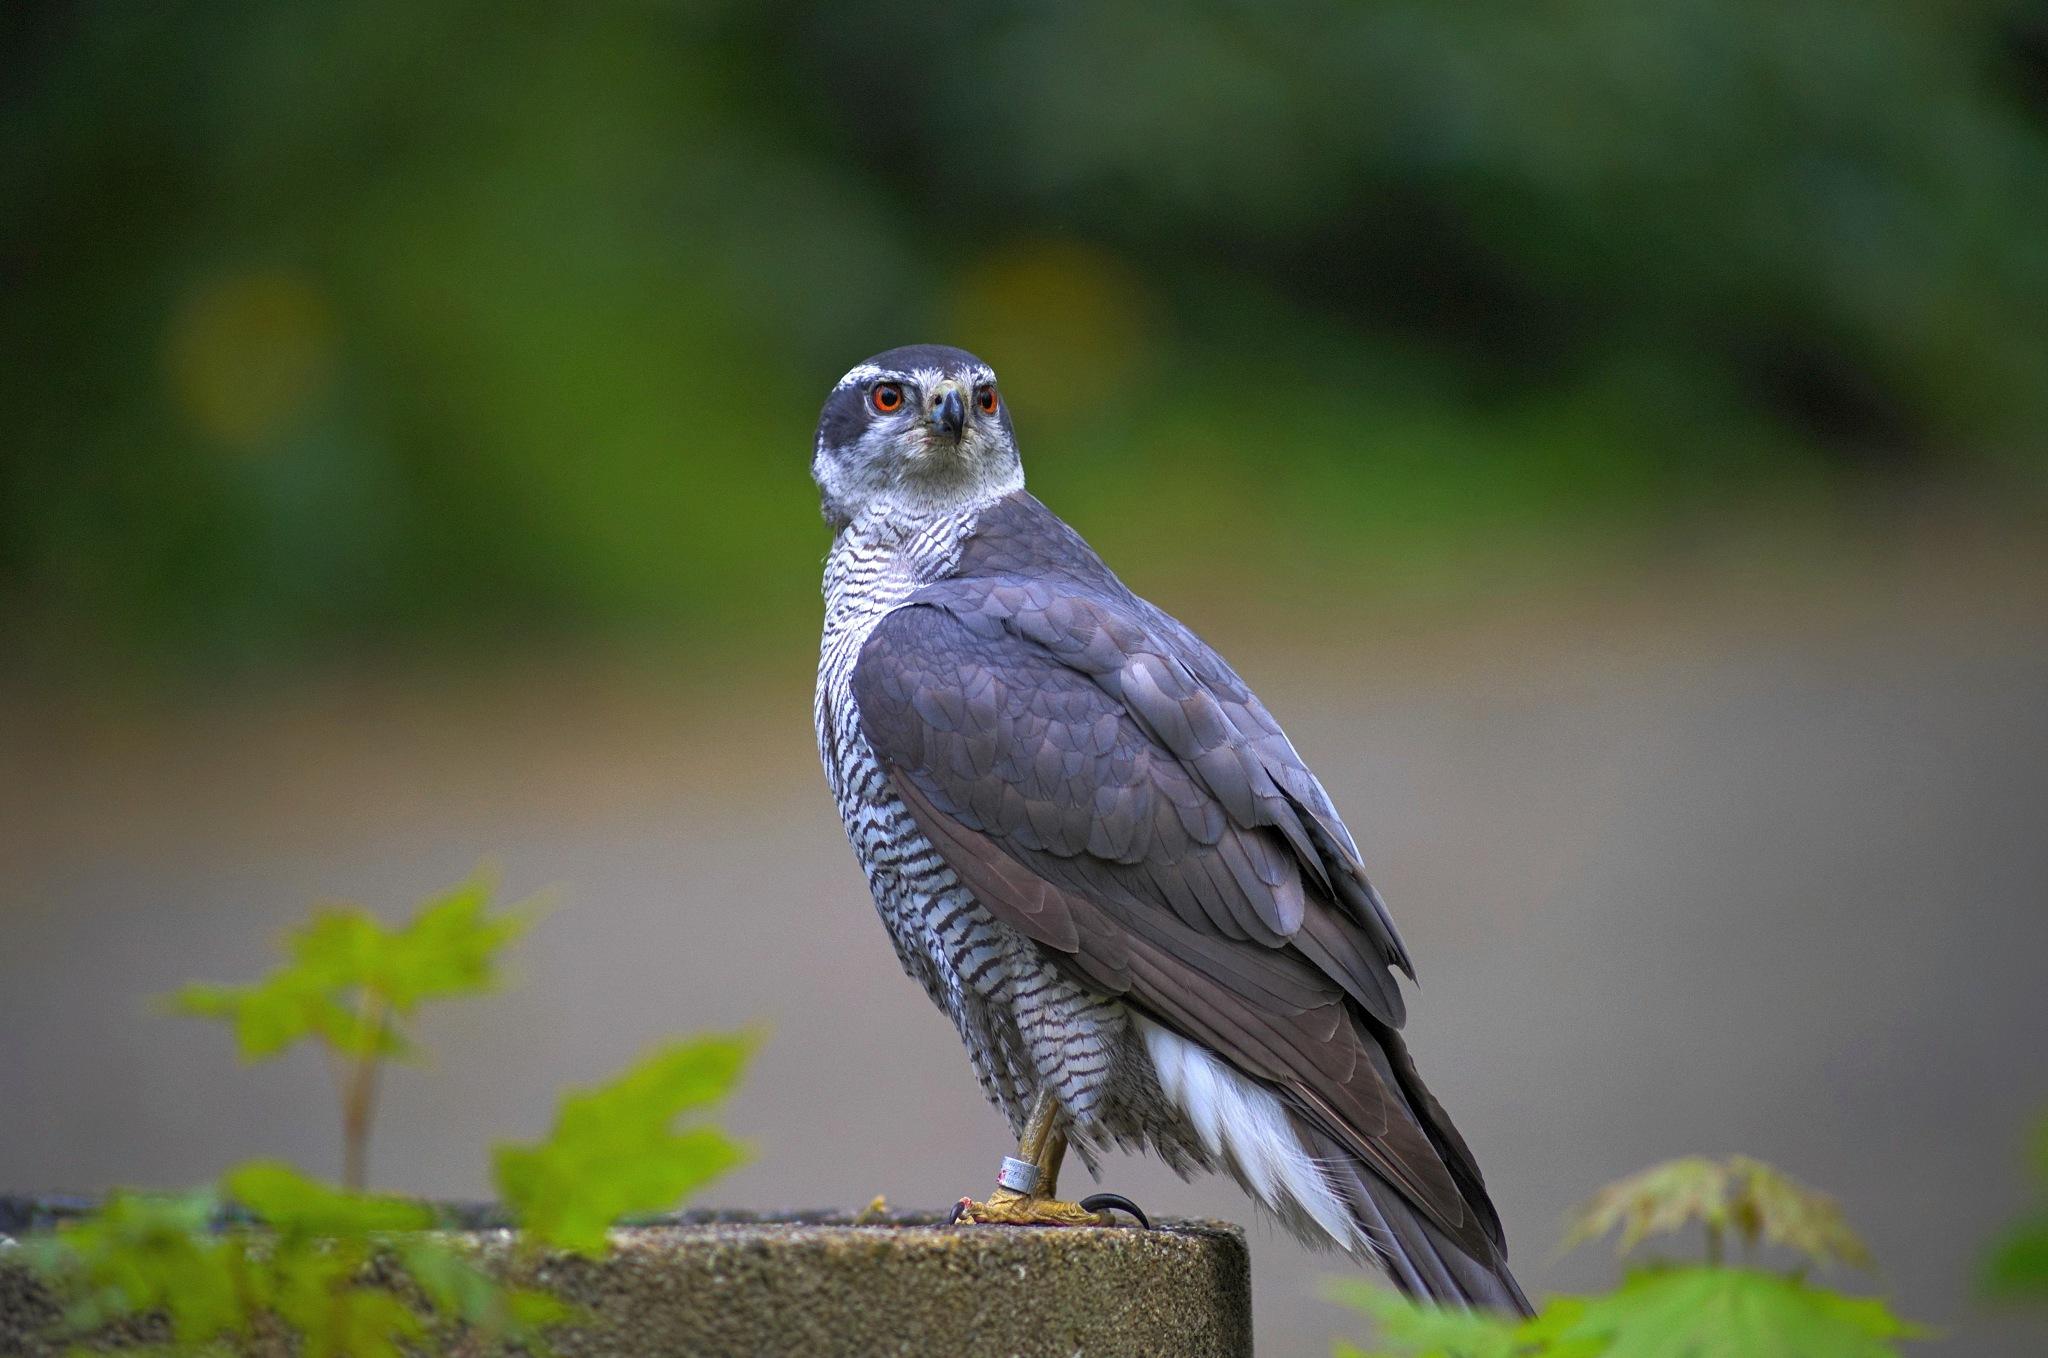 thirsty hawk by klangraumberlin